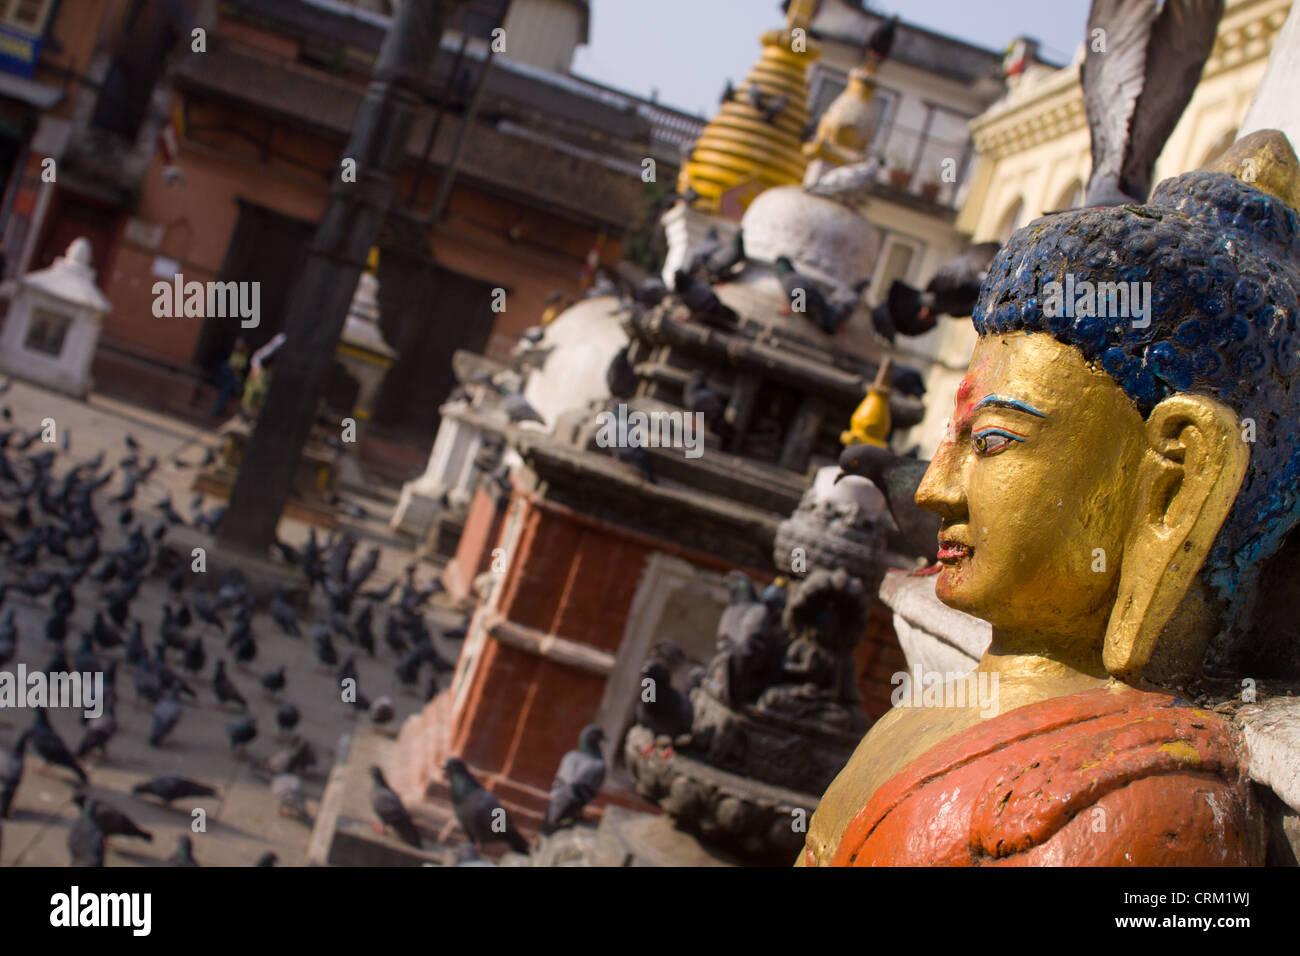 Katmandu, temple complex. Pictured in Asia, Nepal, Katmandu on March 30, 2011. (CTK Photo/David Tesinsky) - Stock Image